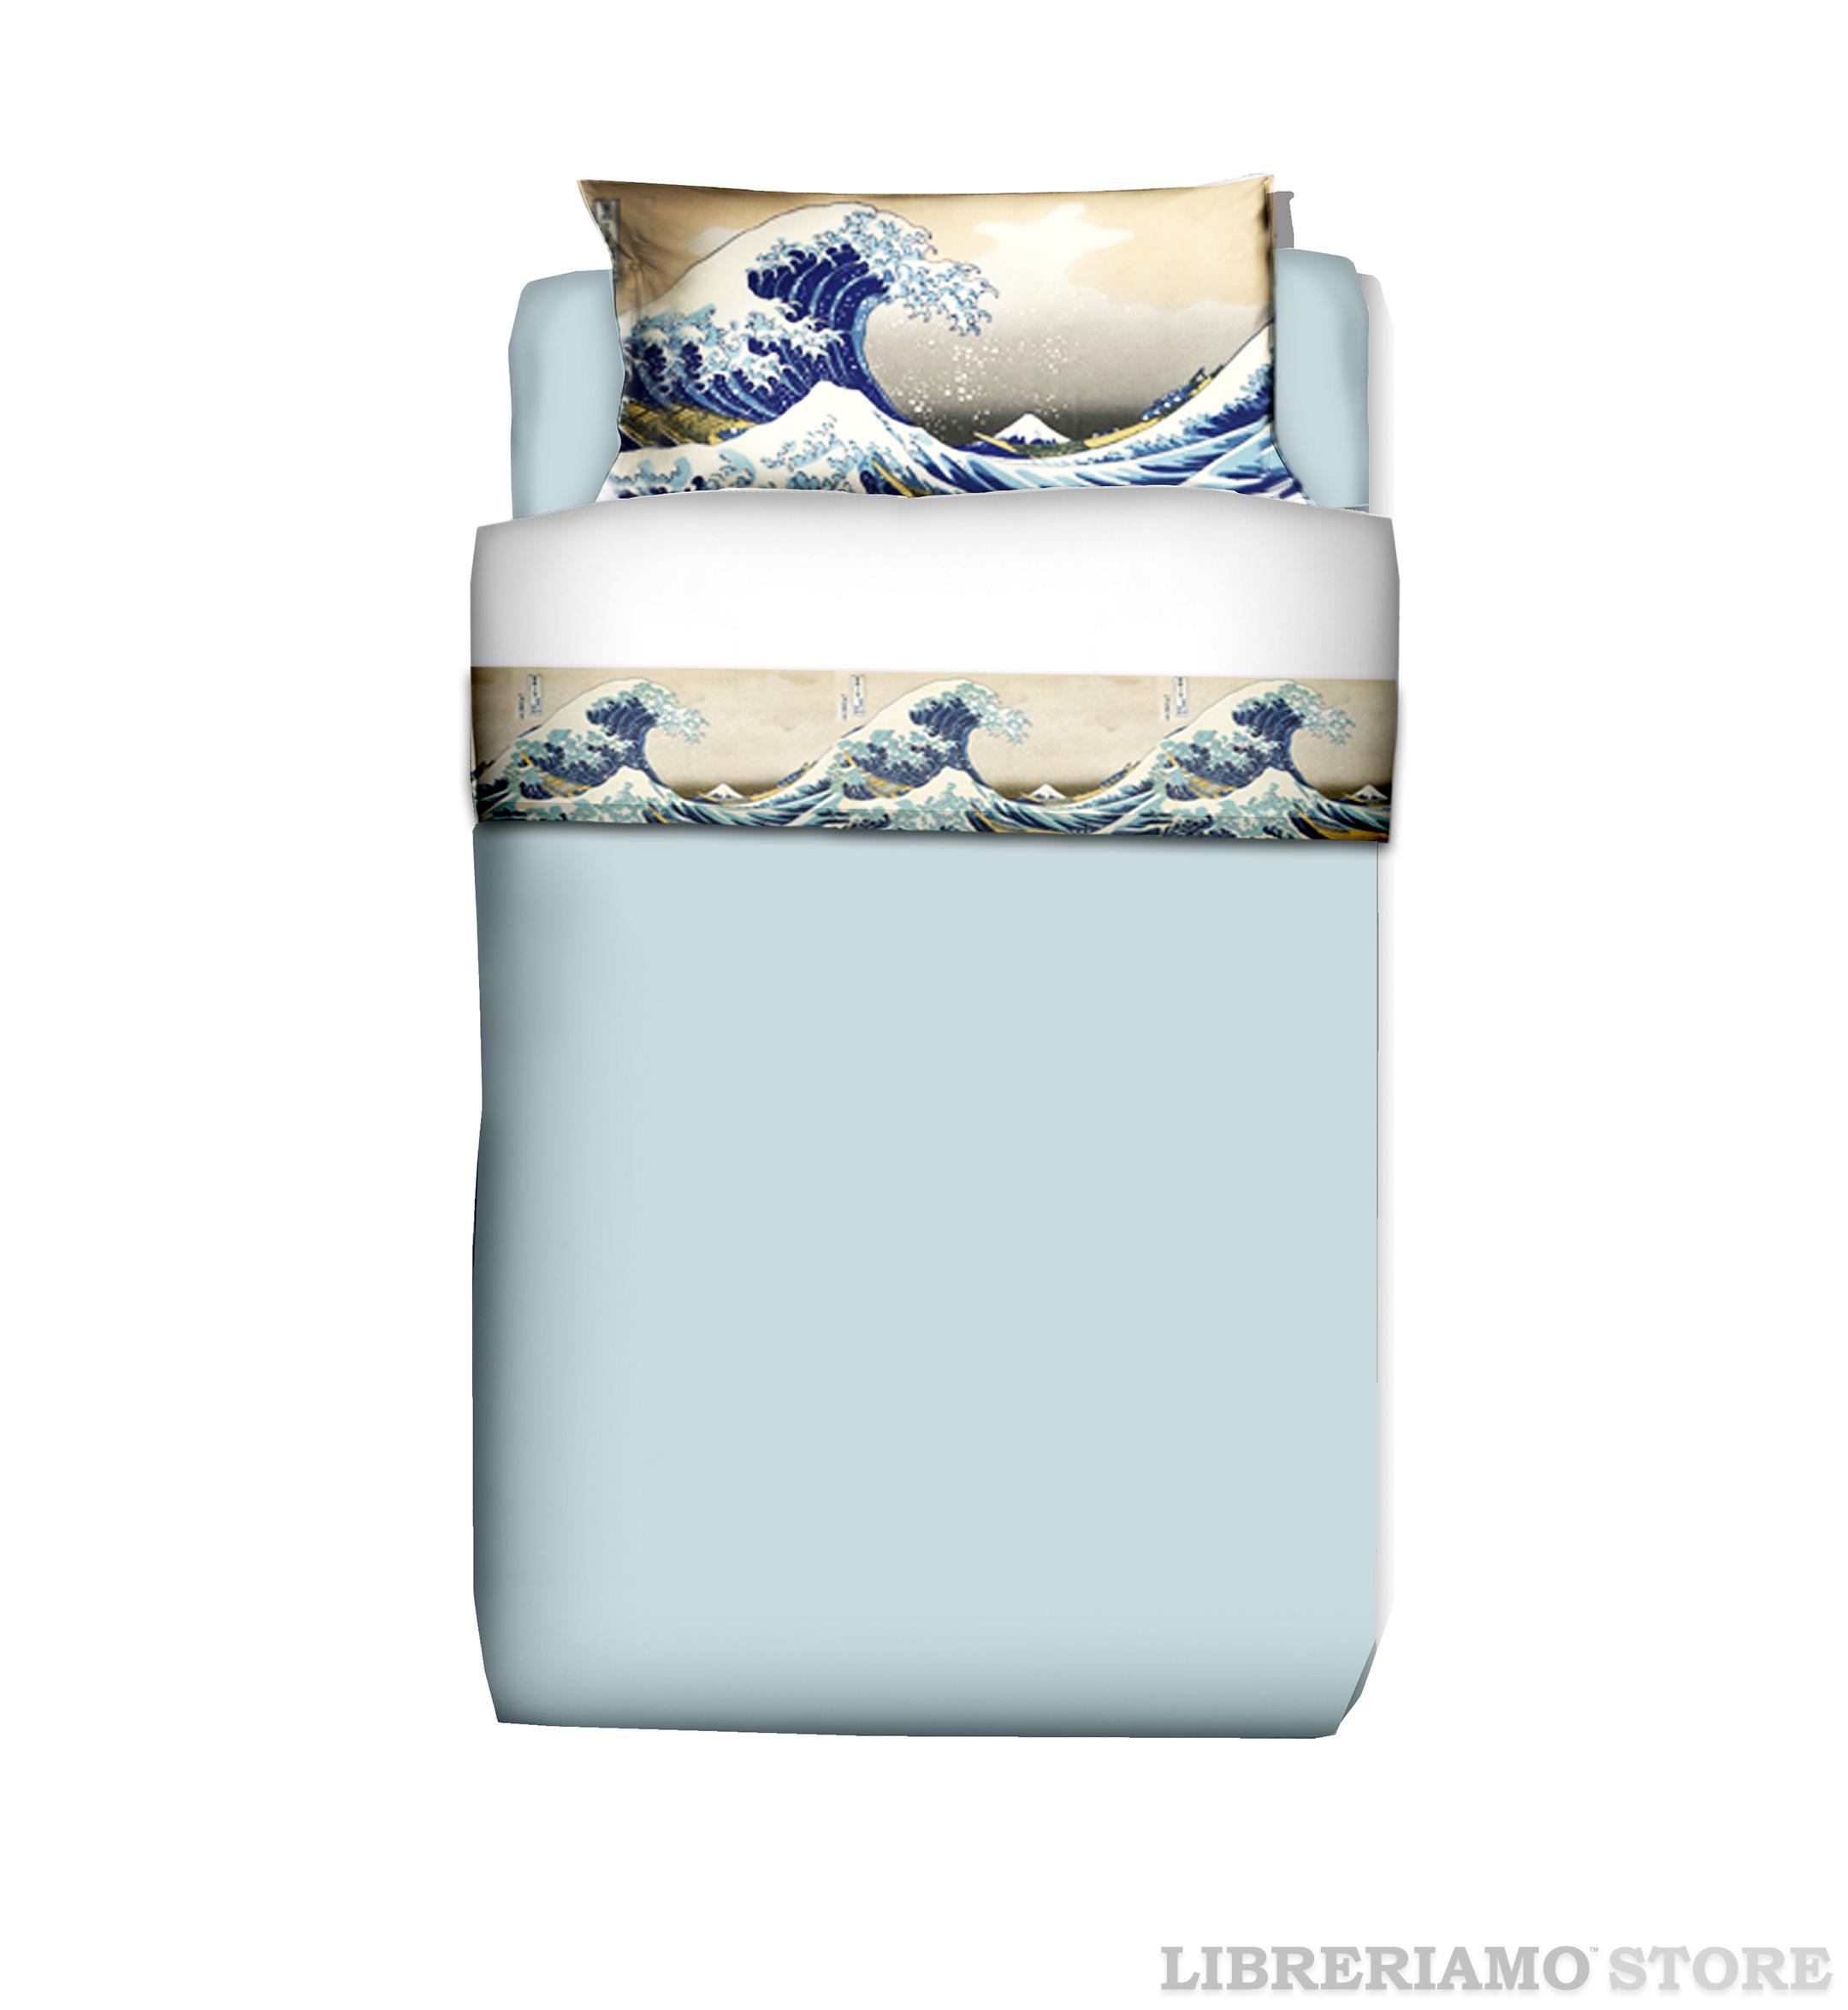 parure-lenzuola-singolo-arredo-arte-hokusai-la-grande-onda-di-kanagawa-manifatturecotoniere-libreriamostore